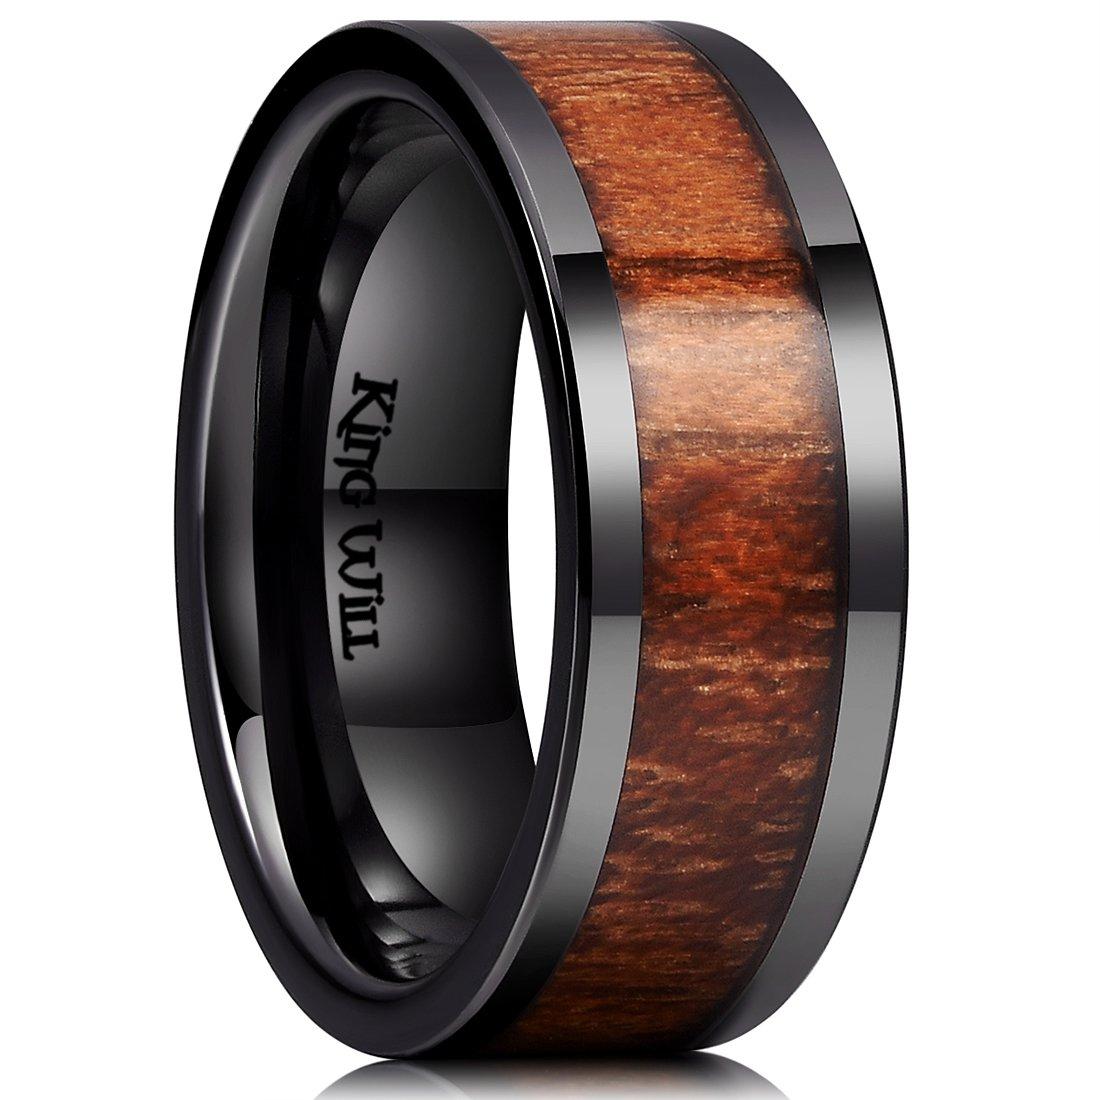 King Will Nature 8mm Black Koa Wood Ceramic Ring Wedding Band Polished Finish Comfort Fit